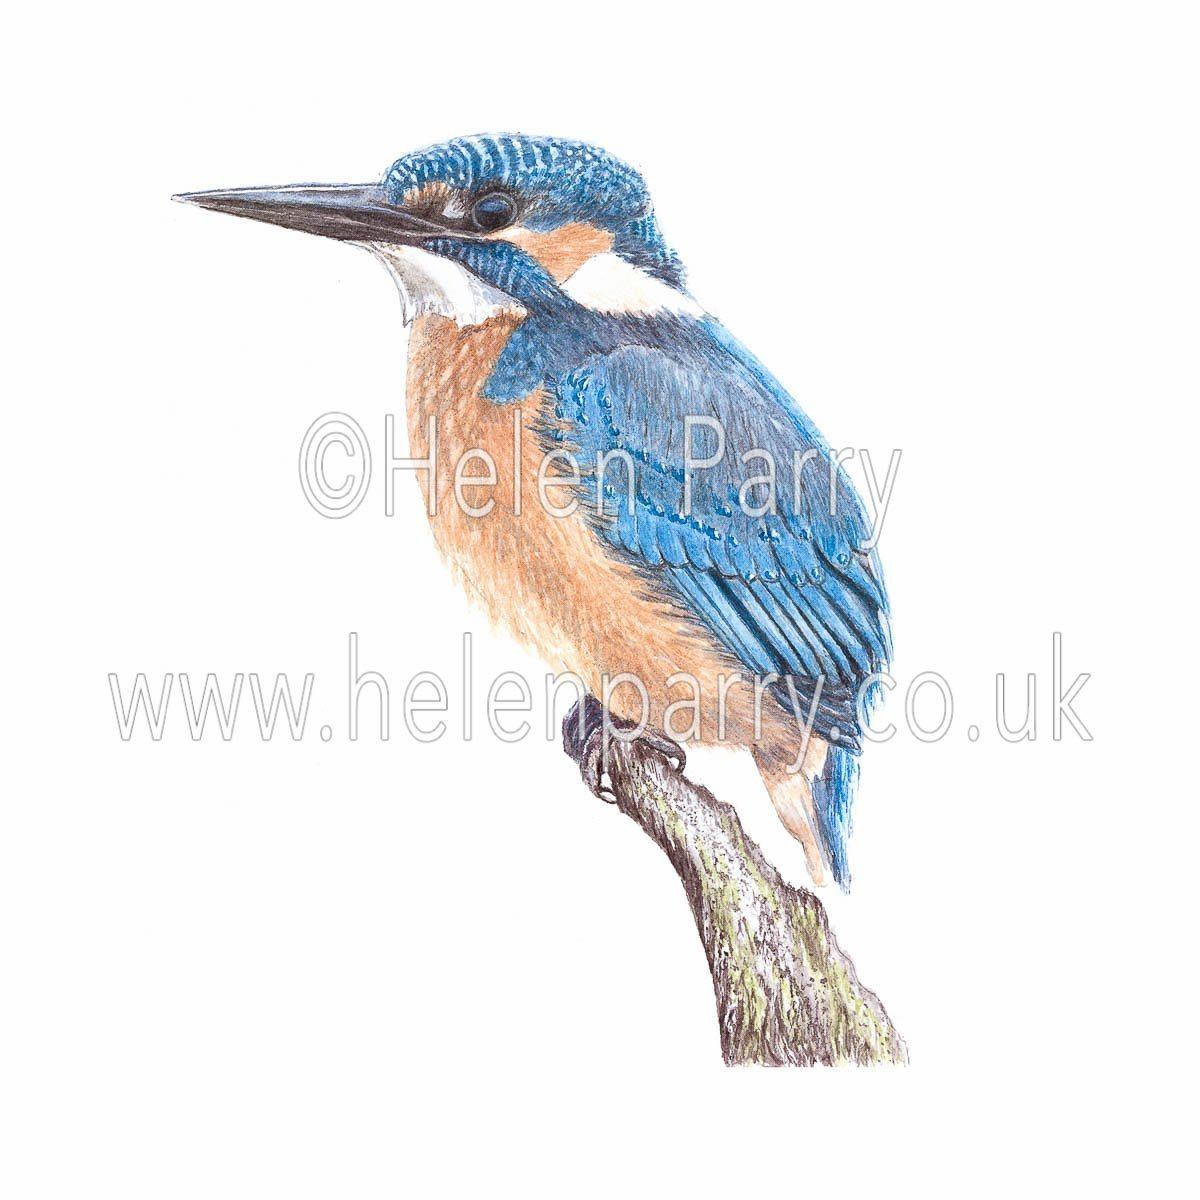 watercolour painting of Kingfisher wild bird